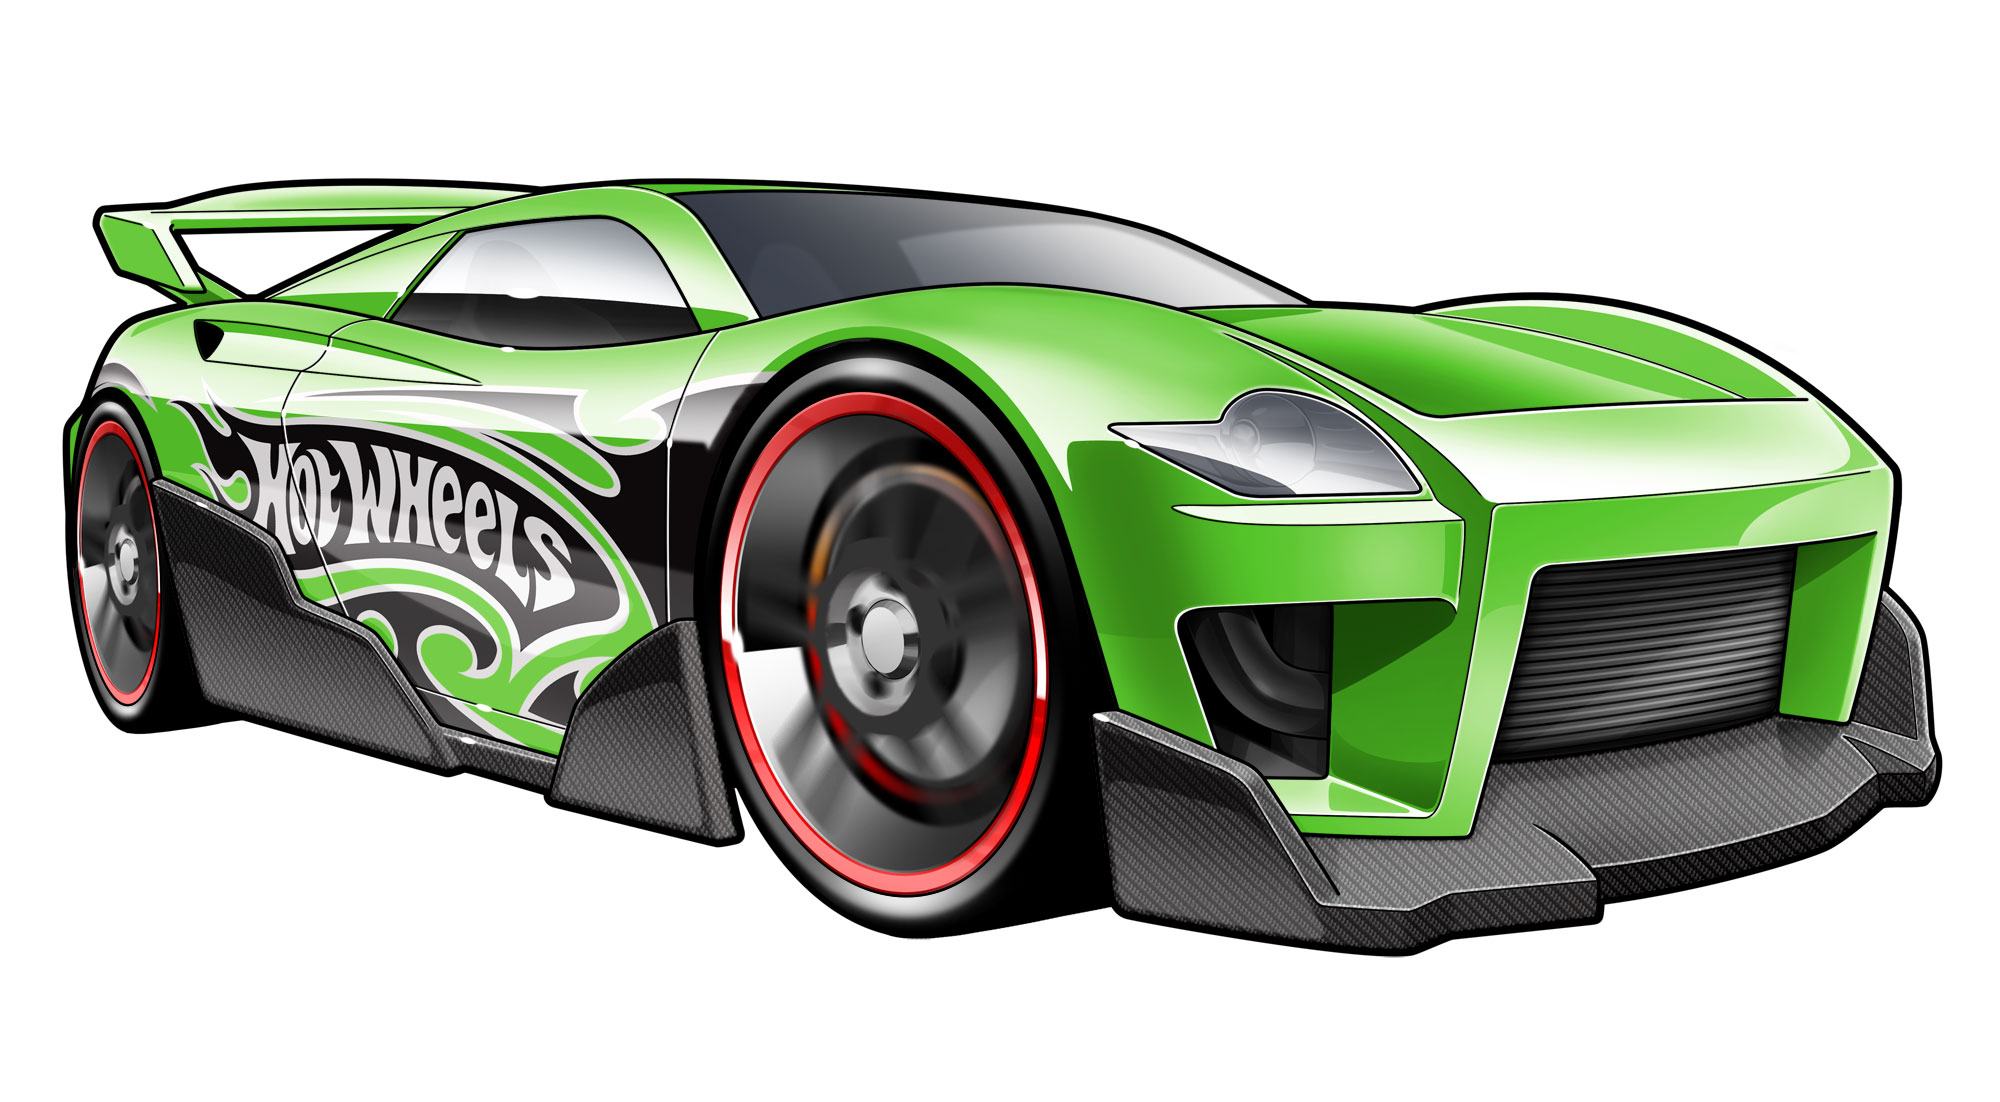 Hot Wheels clipart race car 1 Seymour Jamie com Hot